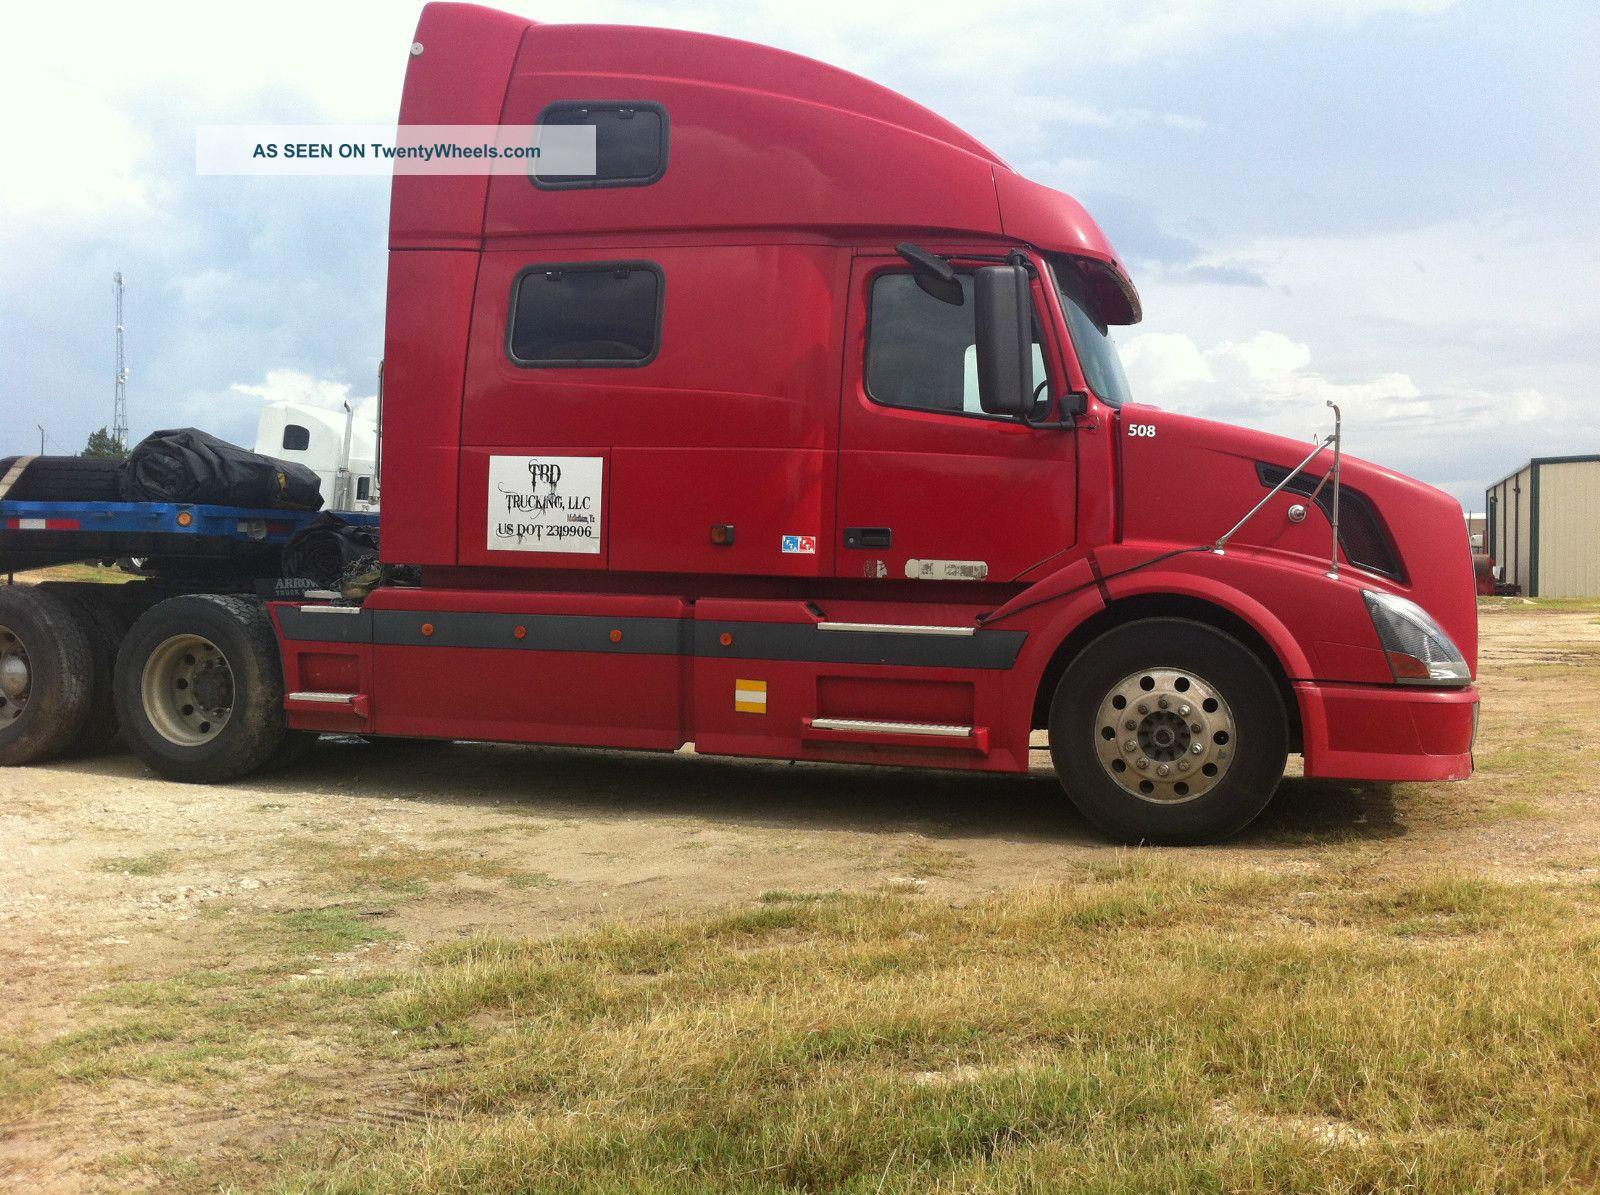 volvo vnl 780 fuse box volvo 260 fuse box wiring diagram volvo truck fuse panel volvo truck fuse diagram